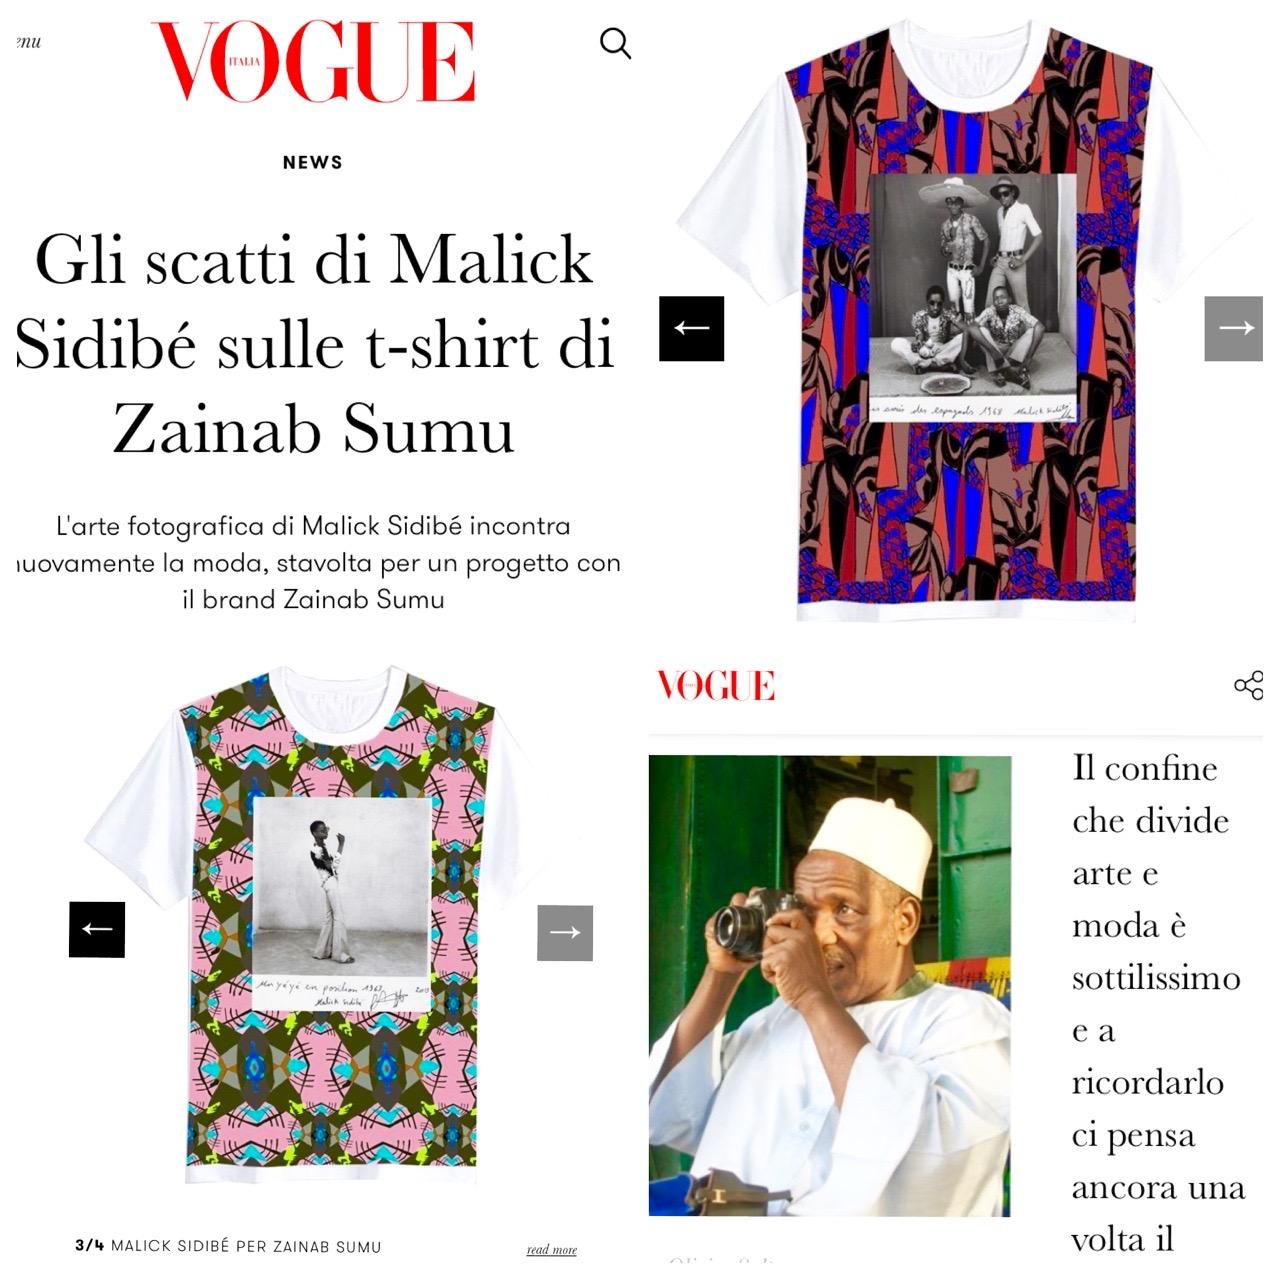 Italian Vogue - Malick Sidibe x Zainab Sumu T-Shirt Collab